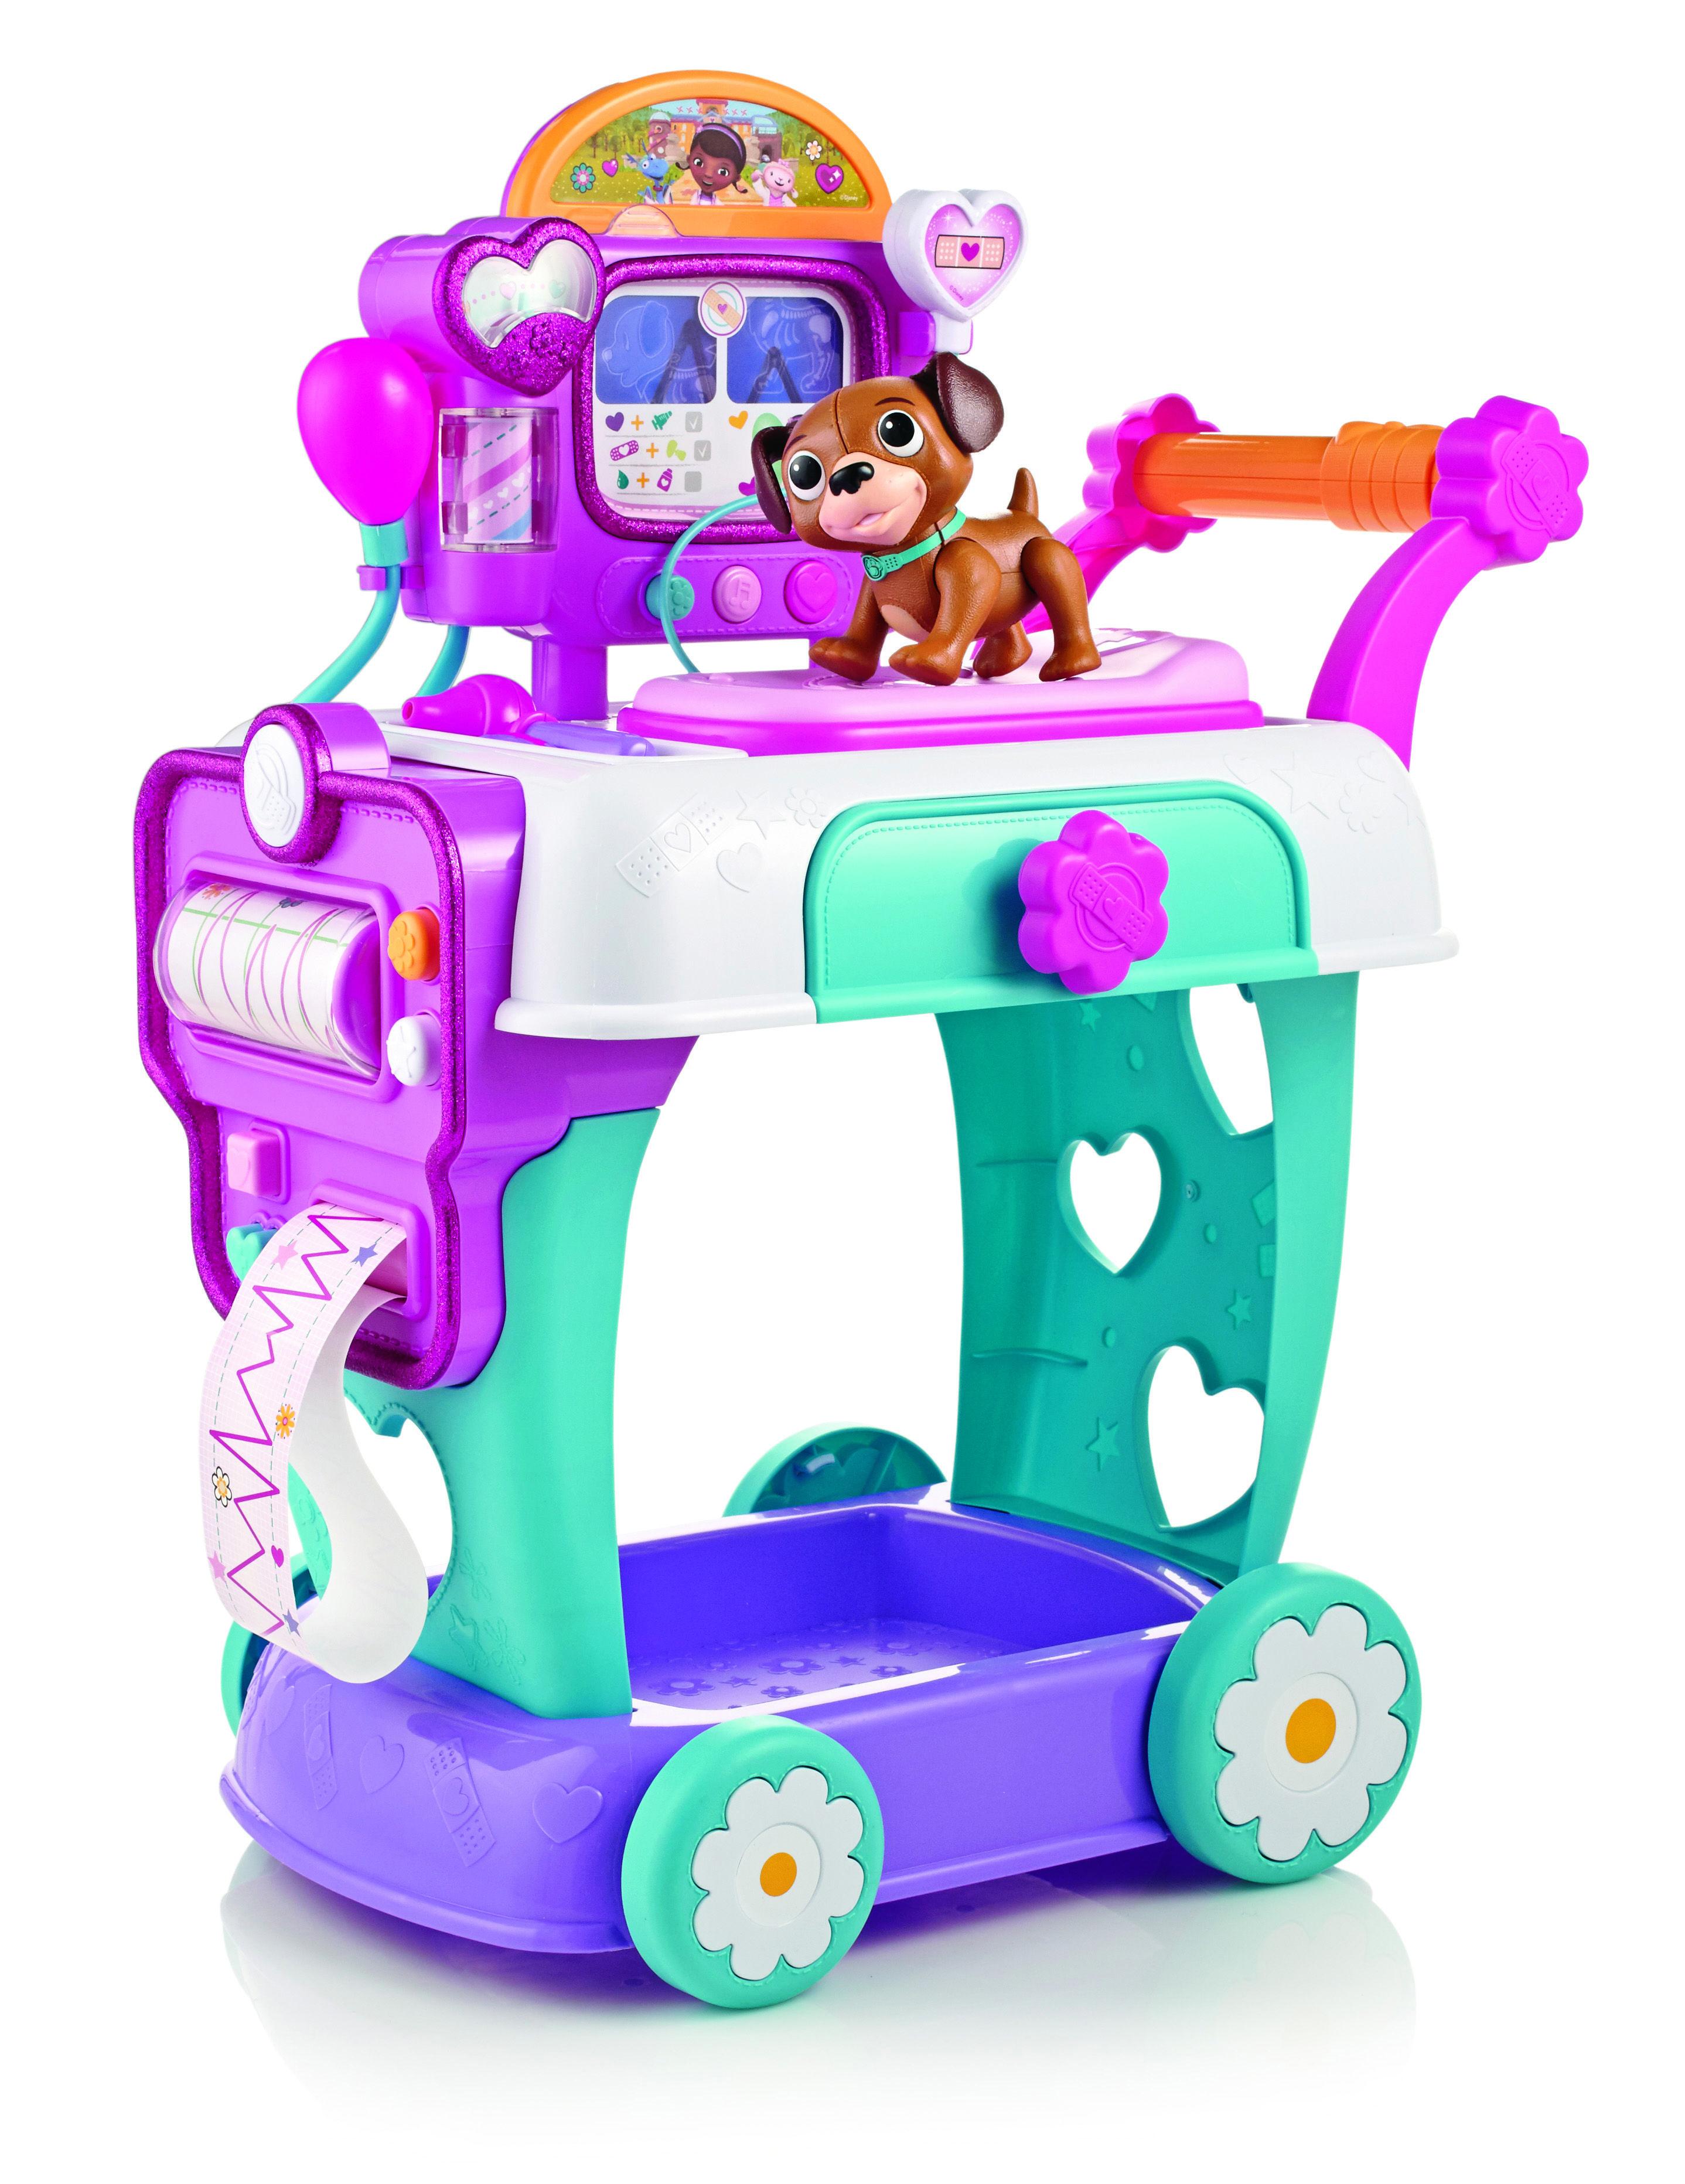 Toys Cool Toys For Girls Toys For Girls Christmas Toys For Girls